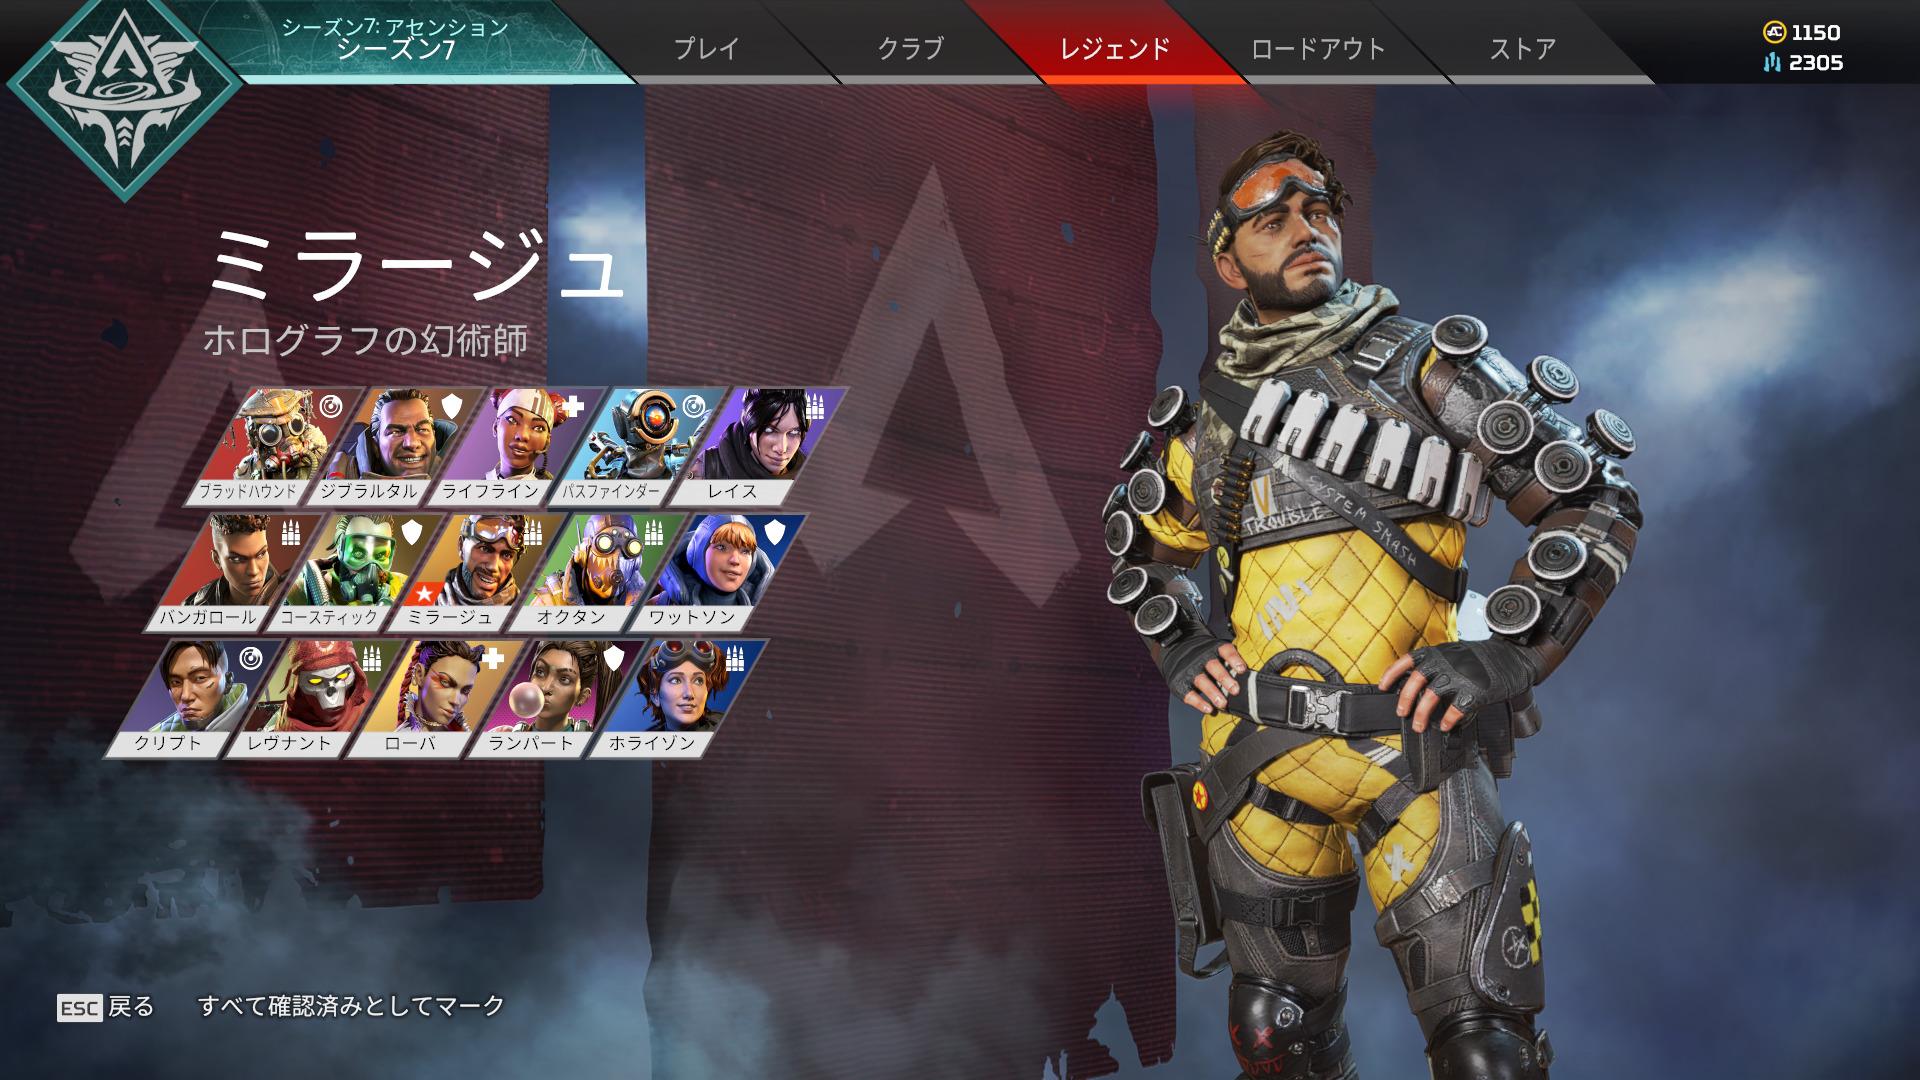 【Apex Legends】ミラージュ 日本語セリフ一覧【基本ボイス】【エーペックスレジェンズ】